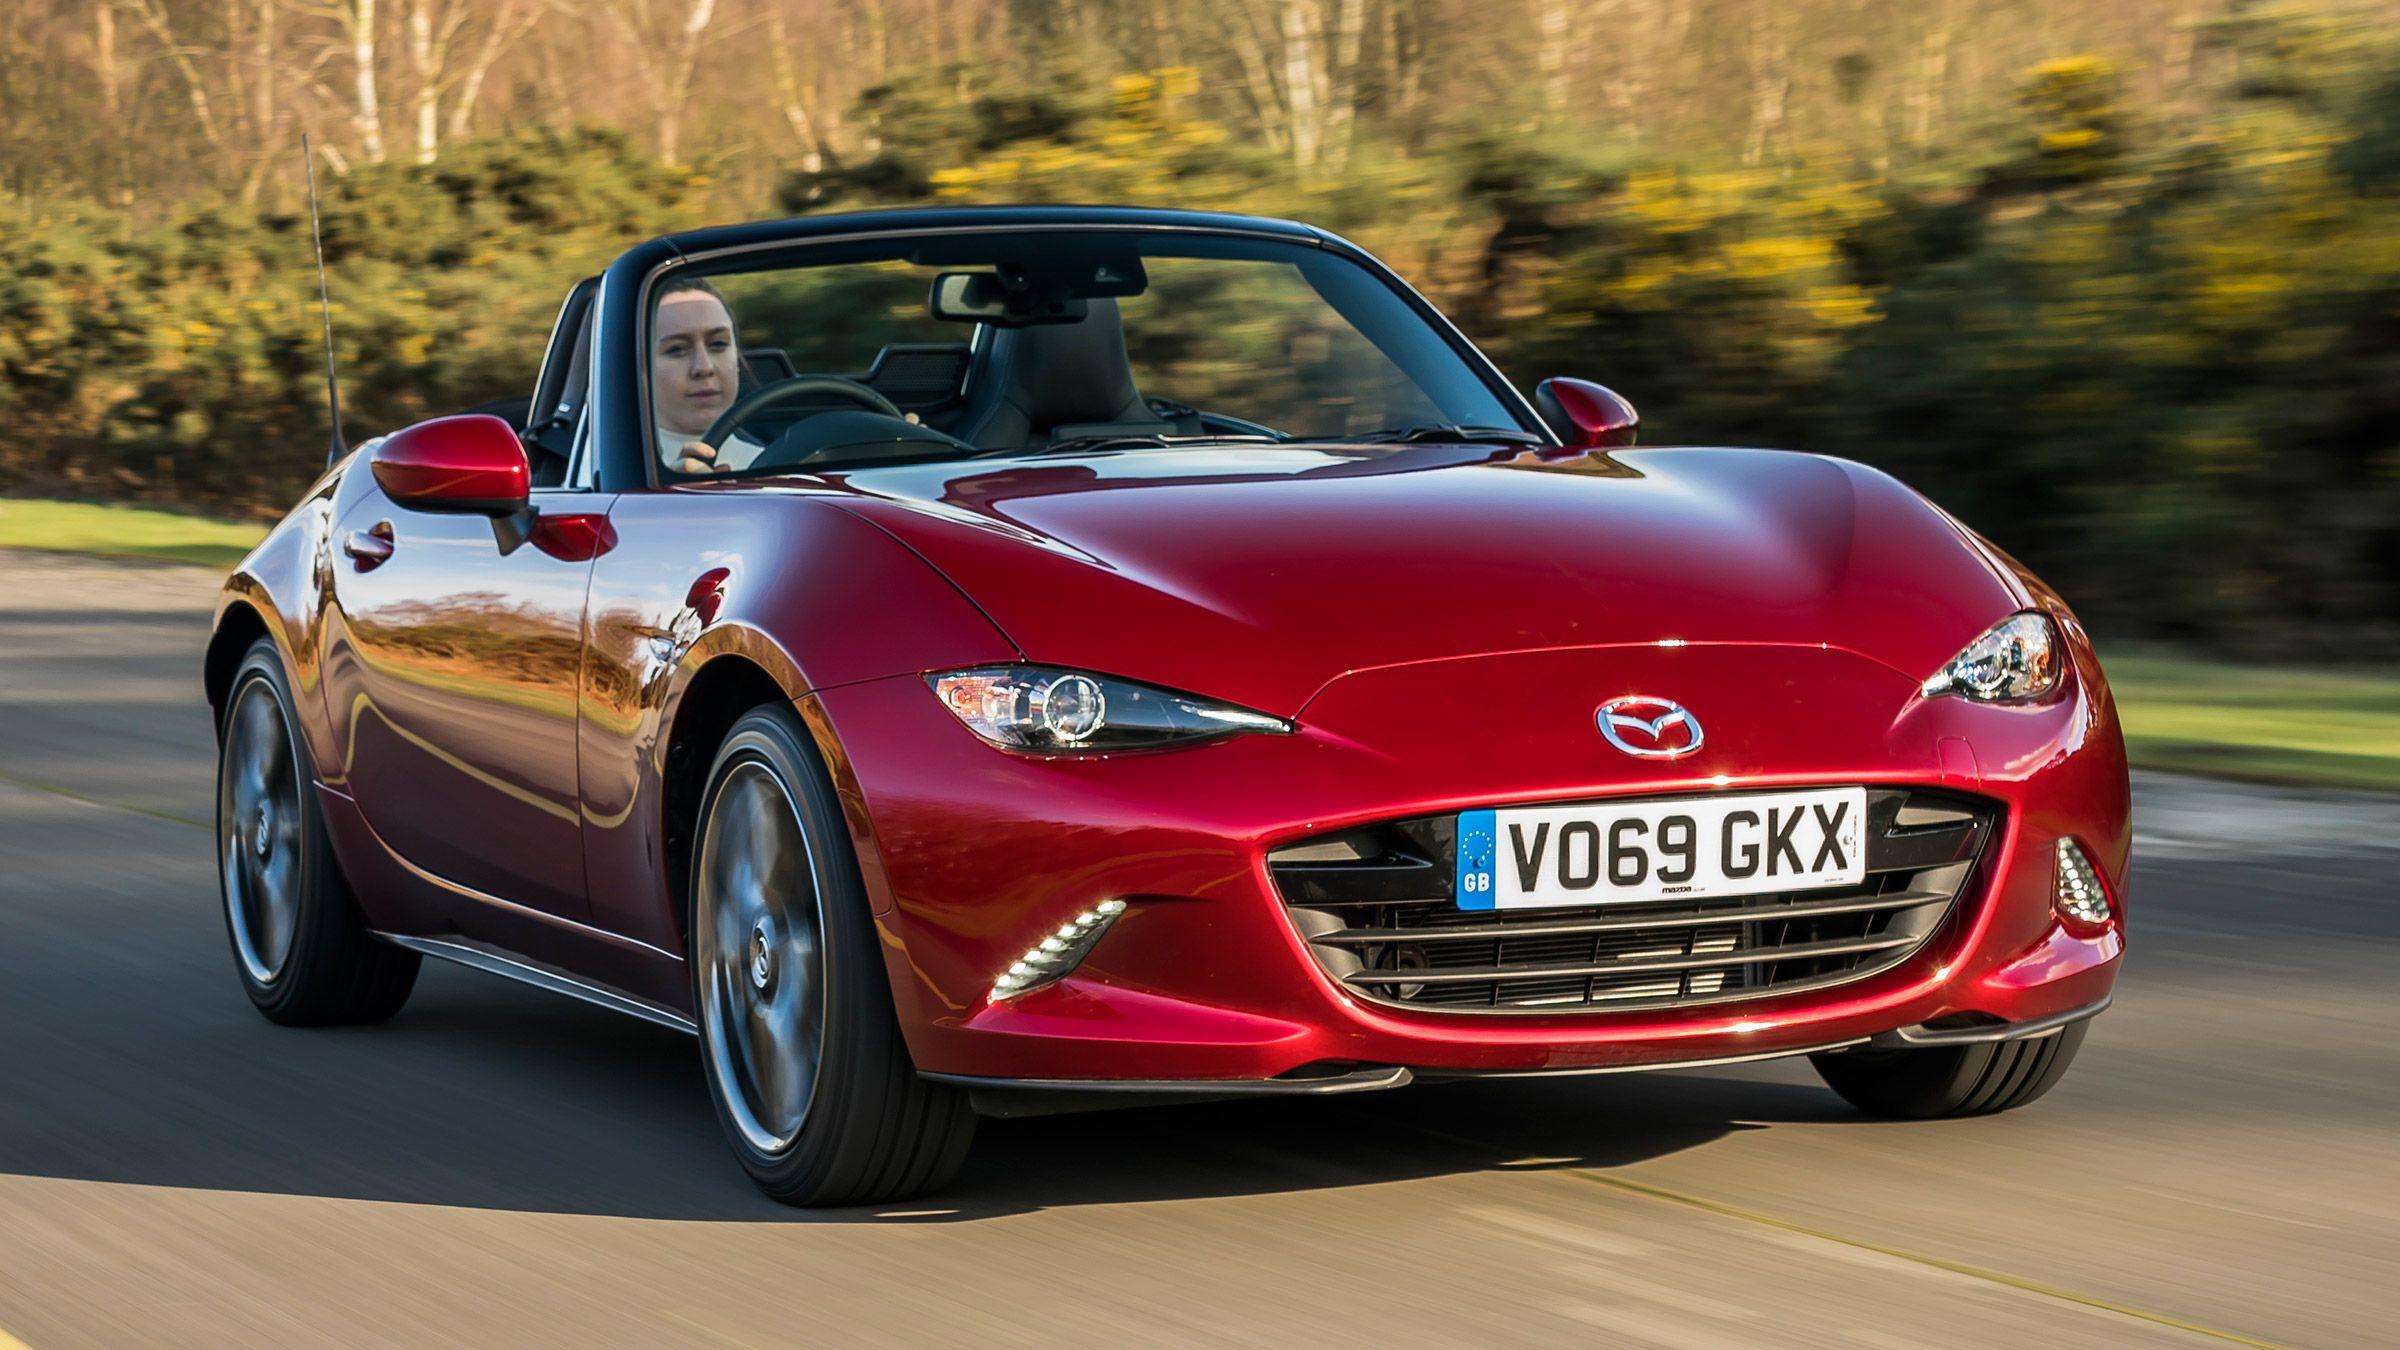 2020 Mazda Mx5 Erste Fahrt en 2020